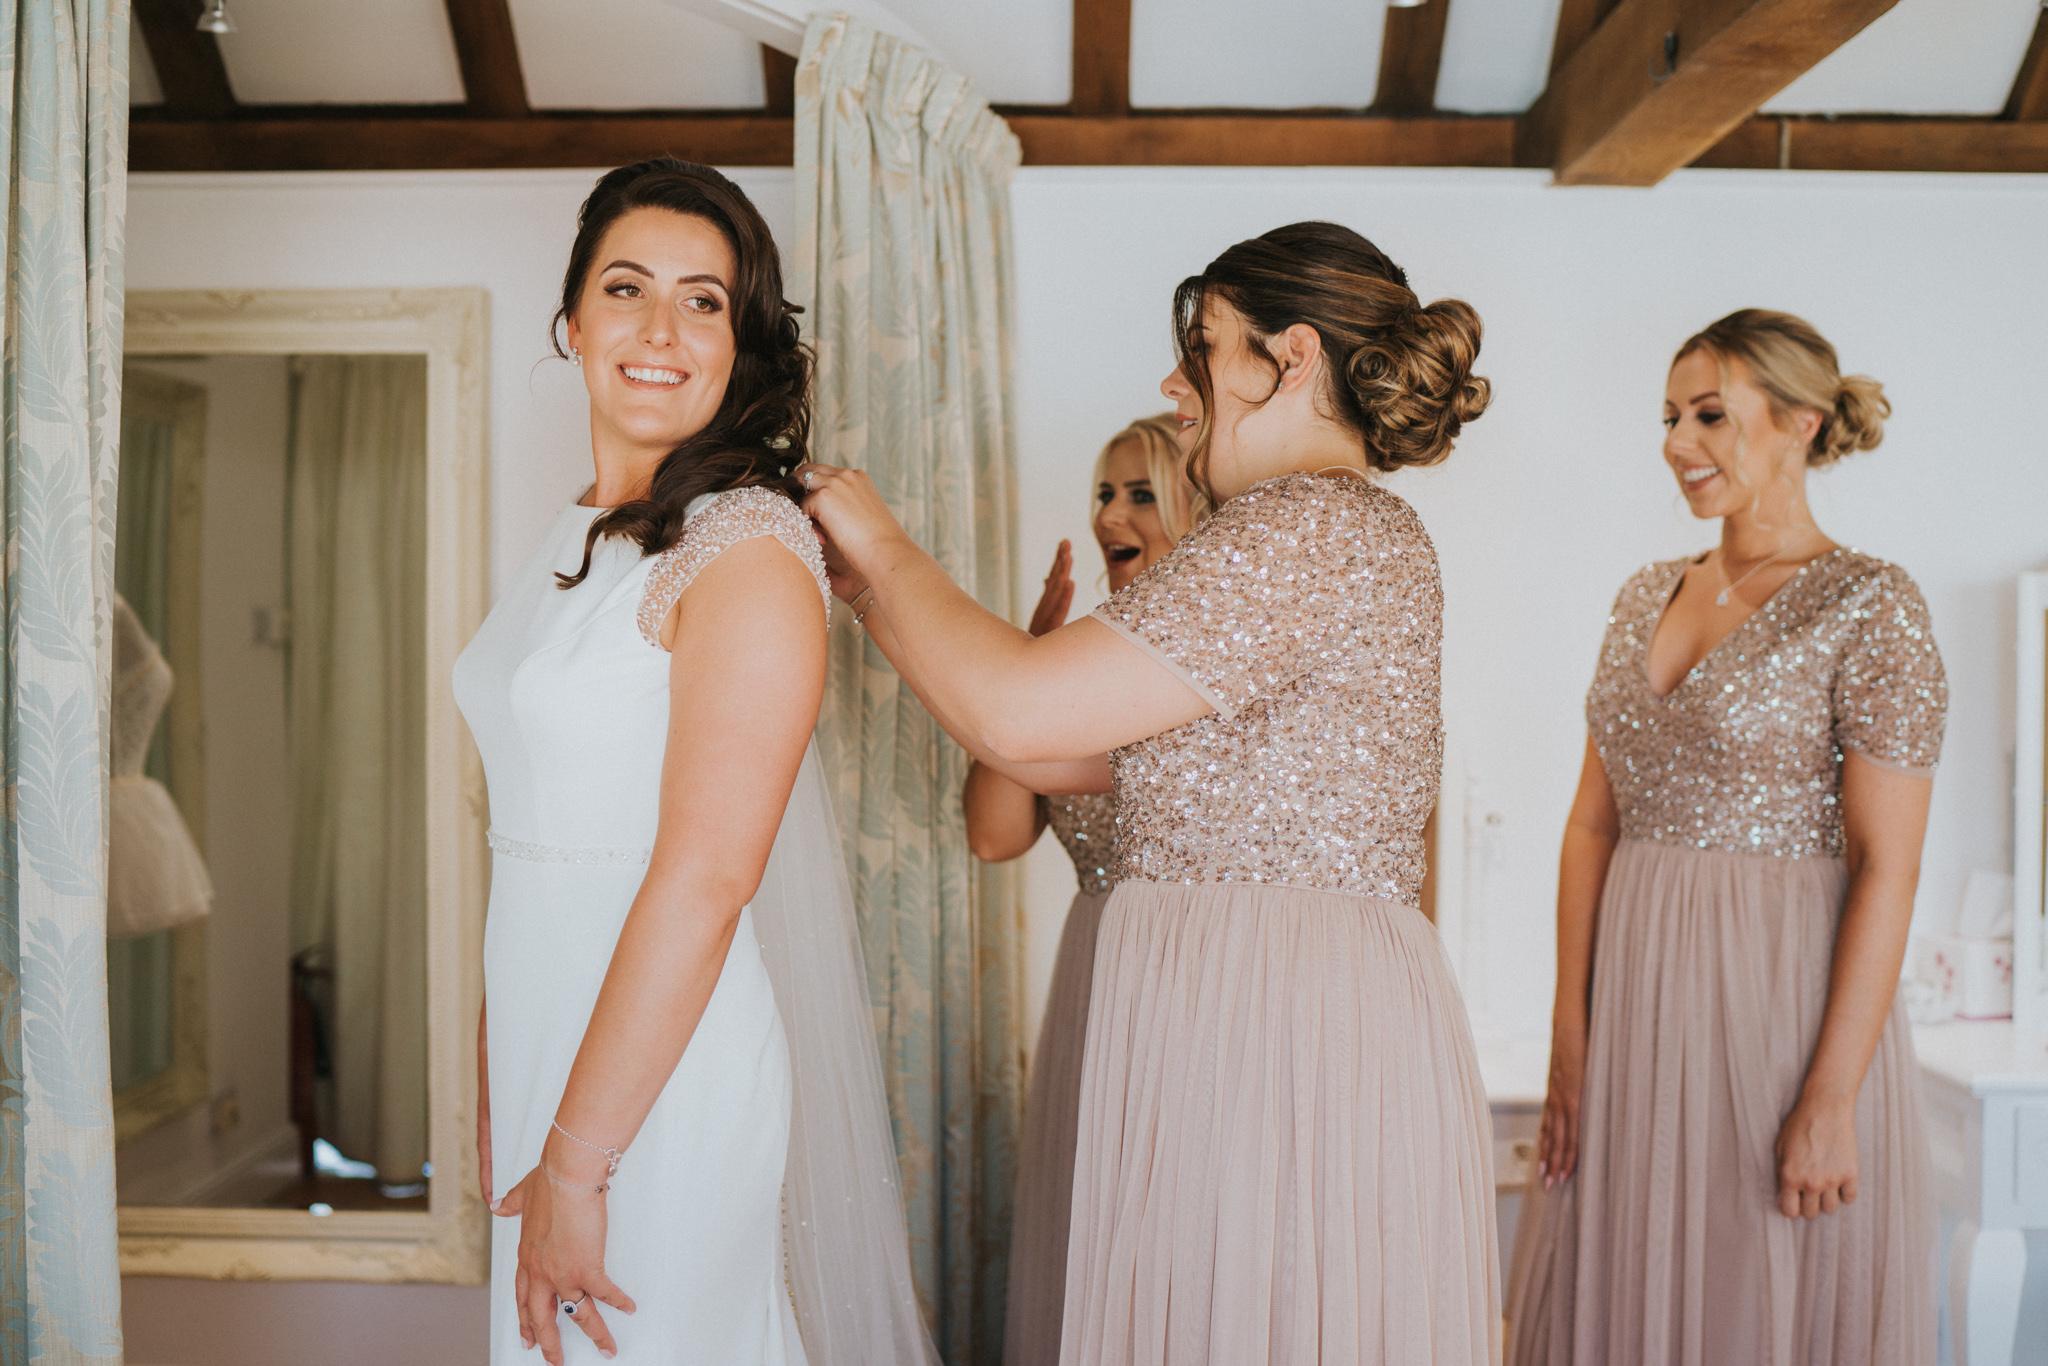 danielle-and-gareths-boho-wedding-previews-at-high-house-weddings-grace-elizabeth-colchester-essex-suffolk-norfolk-devon-alternative-wedding-and-lifestyle-photographer (17 of 76).jpg